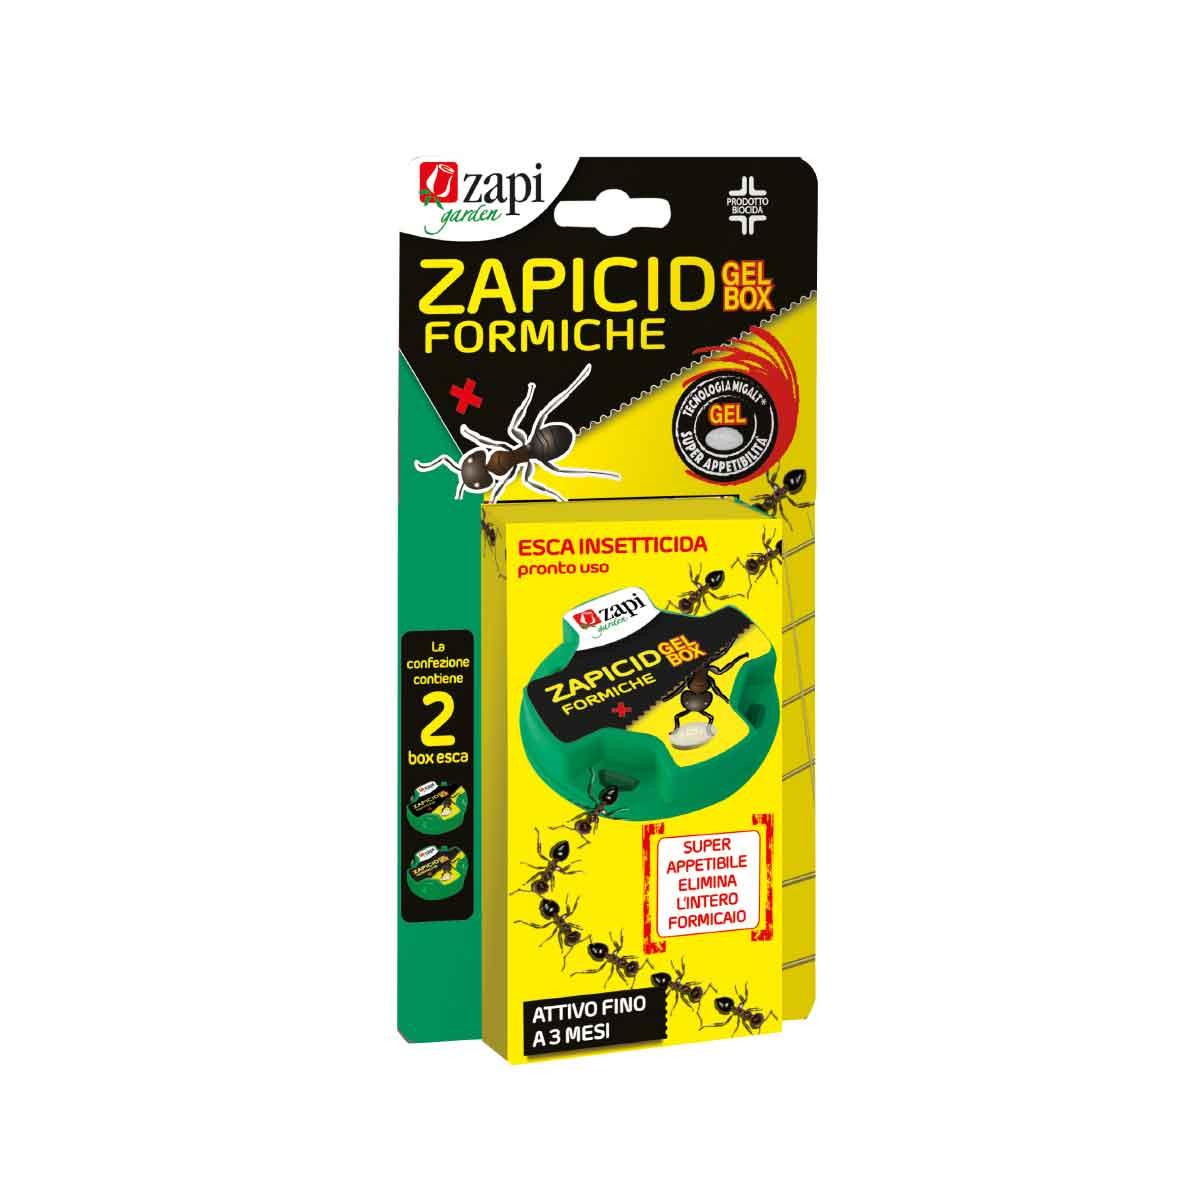 Zapi Zapicid Gel Box Formiche